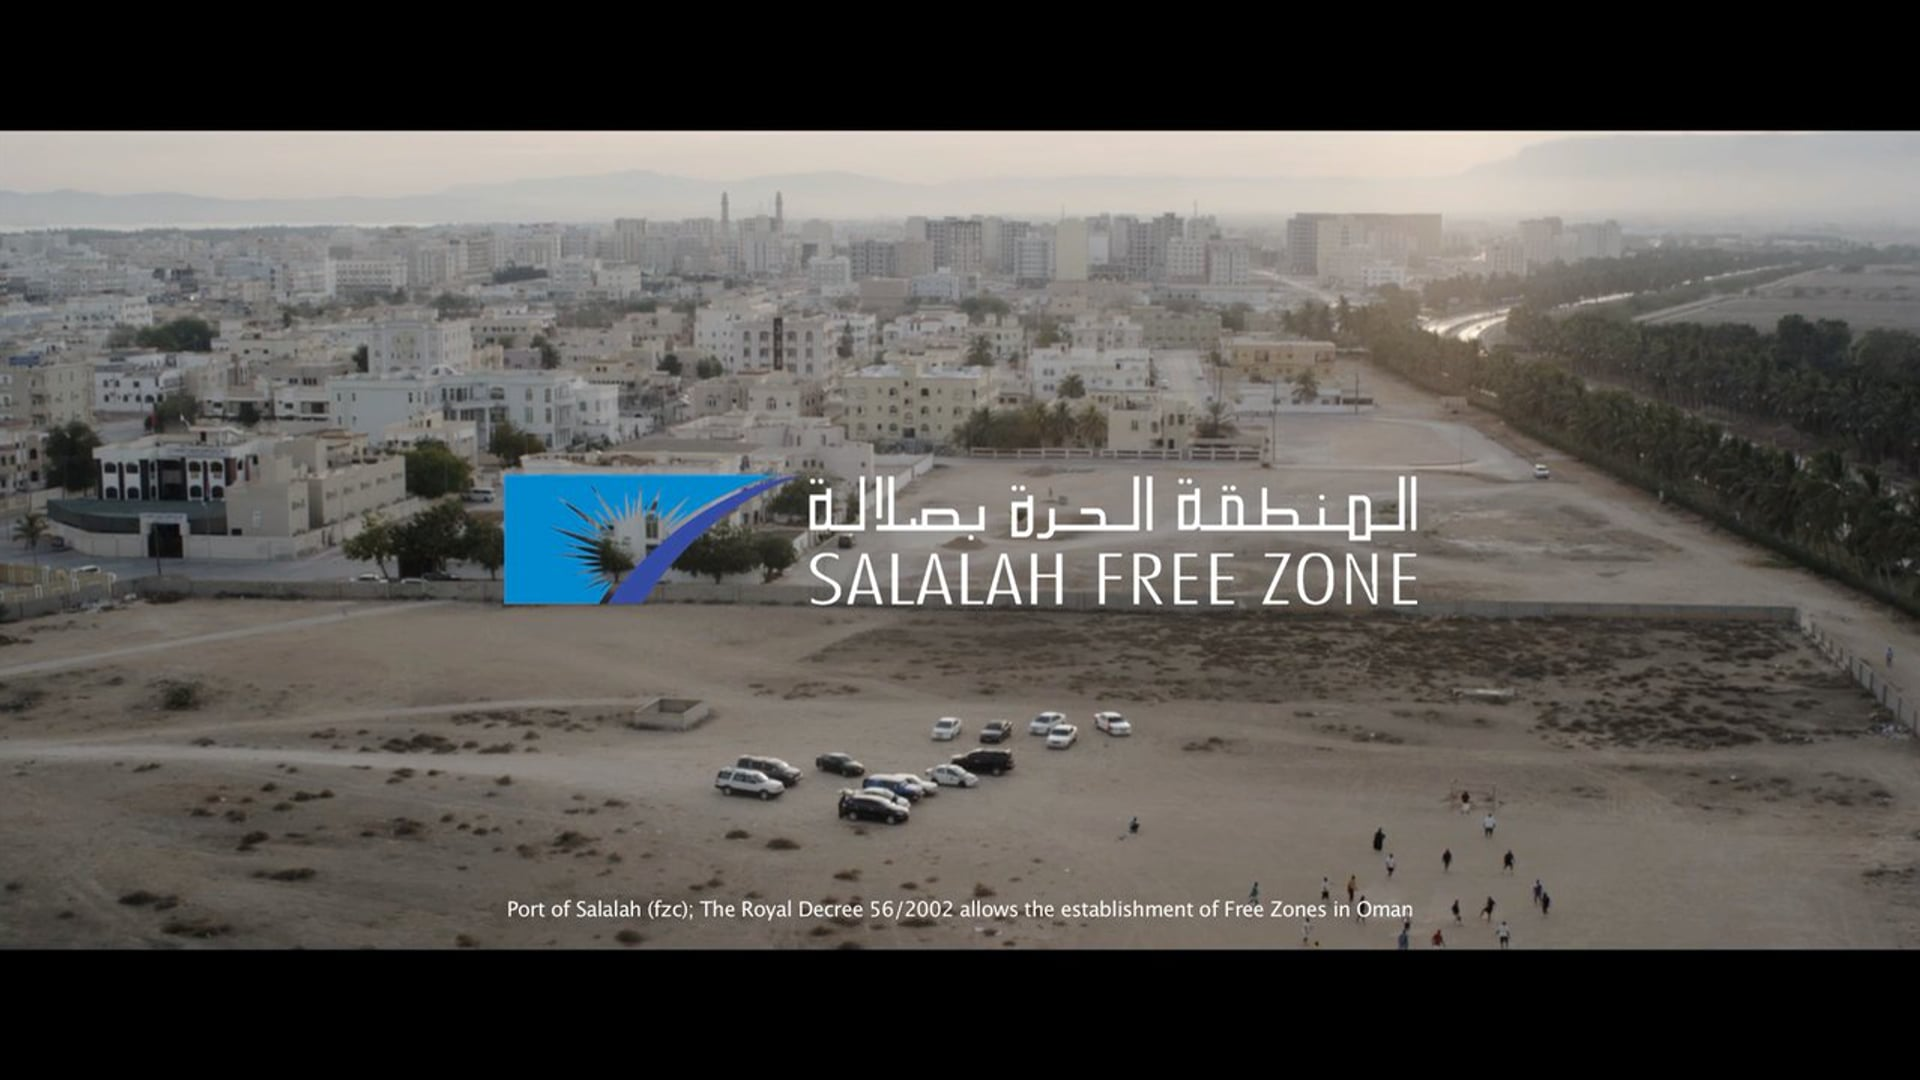 Salalah Free Zone (Oman): Salalah Port